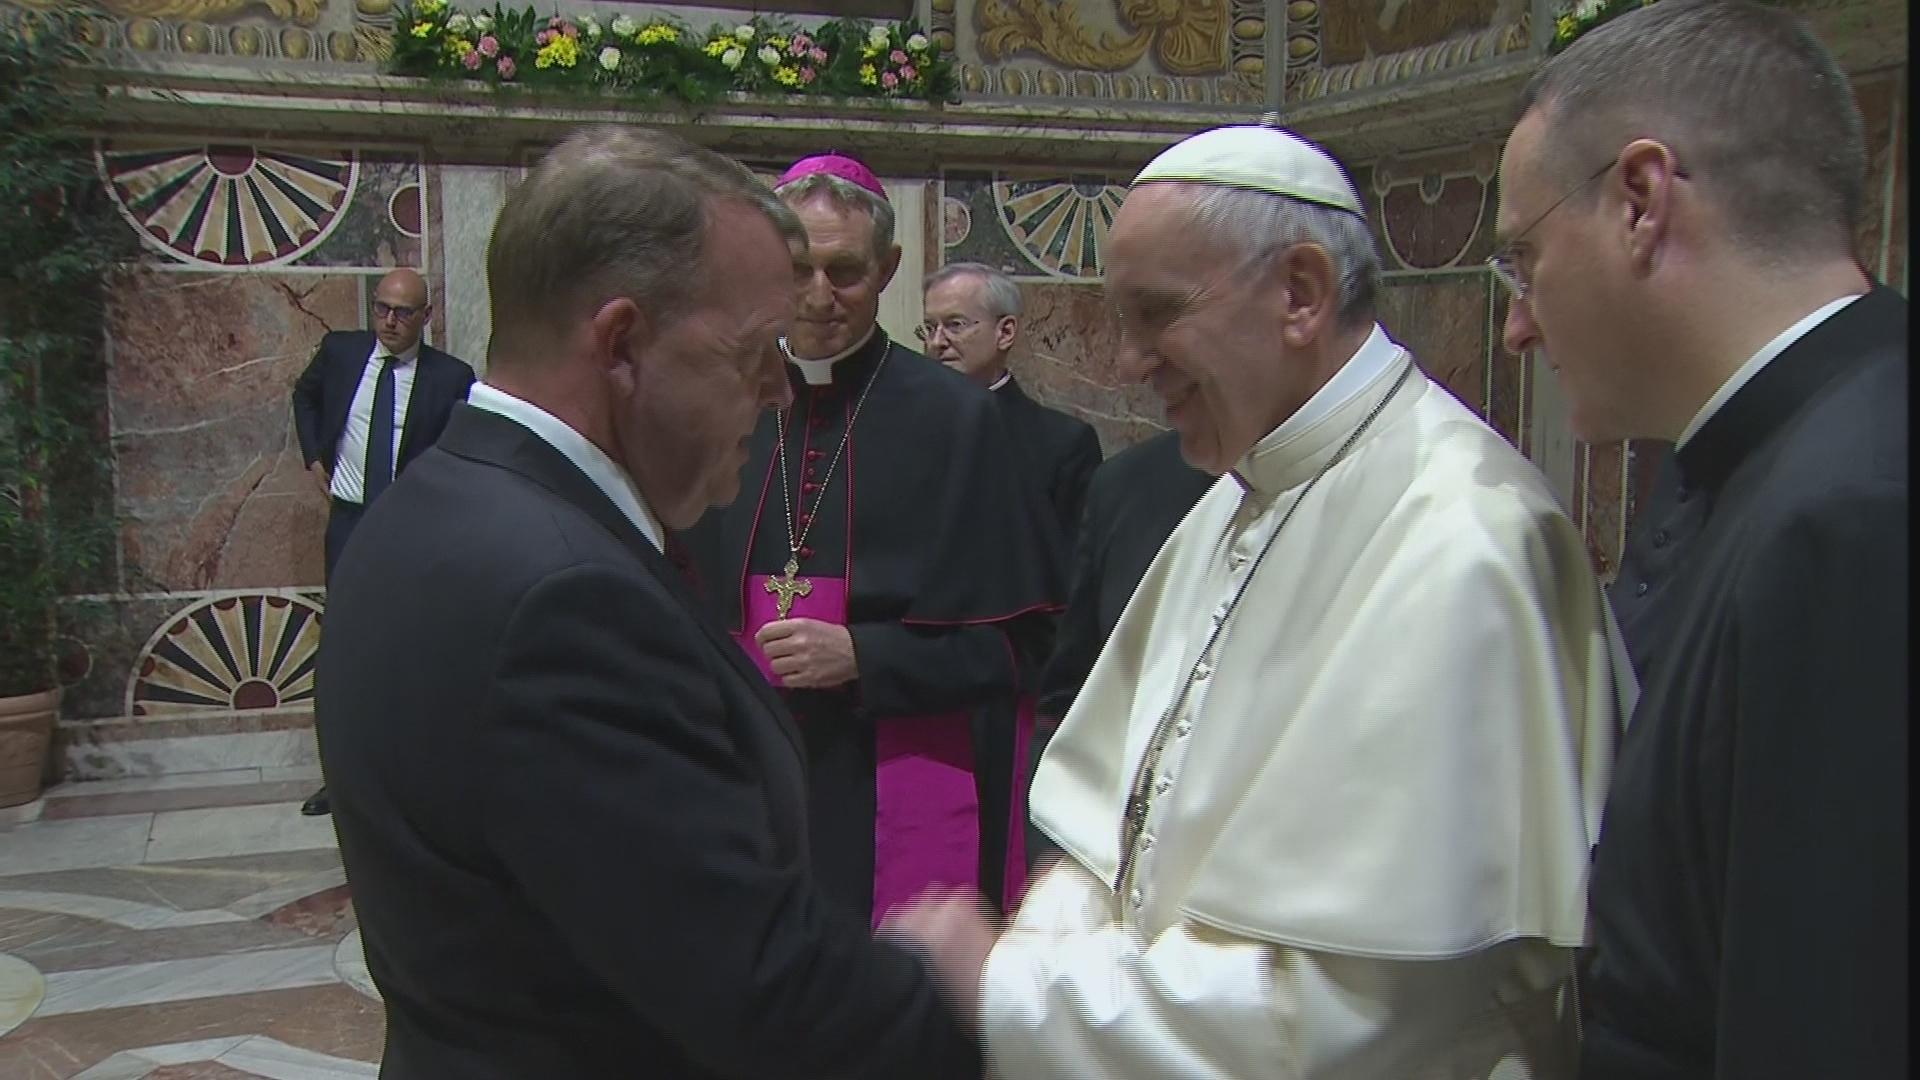 9243850_kgra_udland_ne_vatican_eu_leaders_meet_pope-18.47.39.11.jpeg